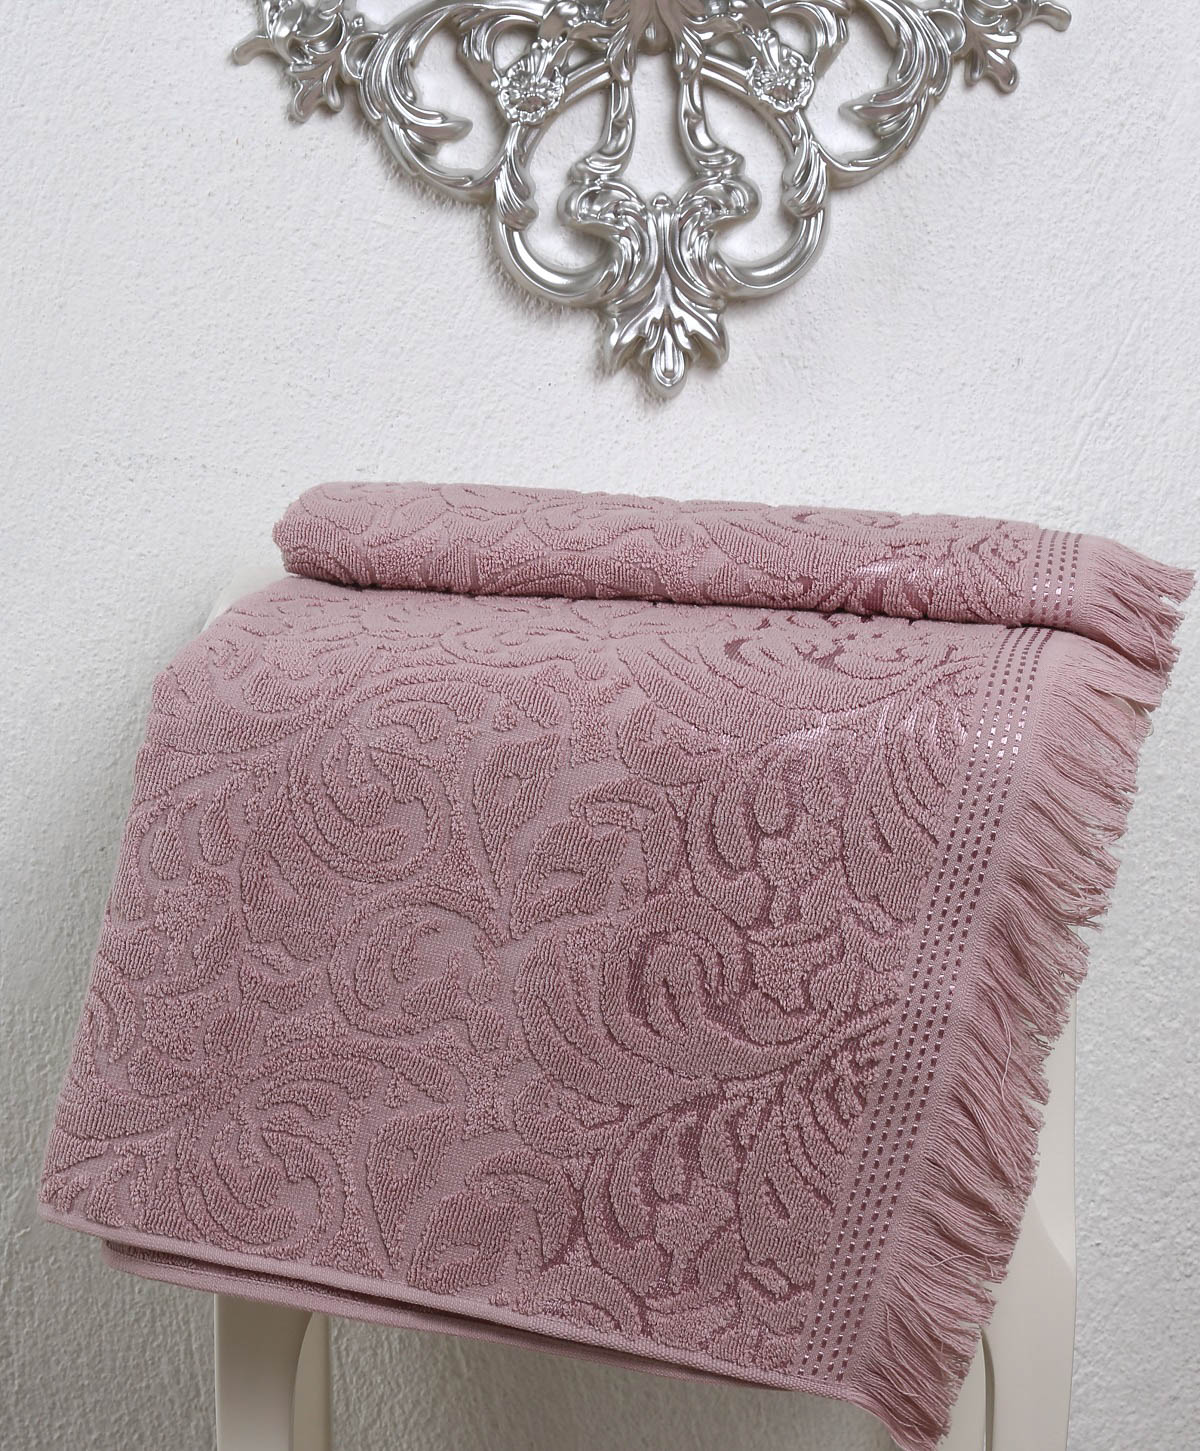 Полотенца Karna Полотенце Esra Цвет: Грязно-Розовый (70х140 см) karna karna полотенце innes цвет красный 70х140 см